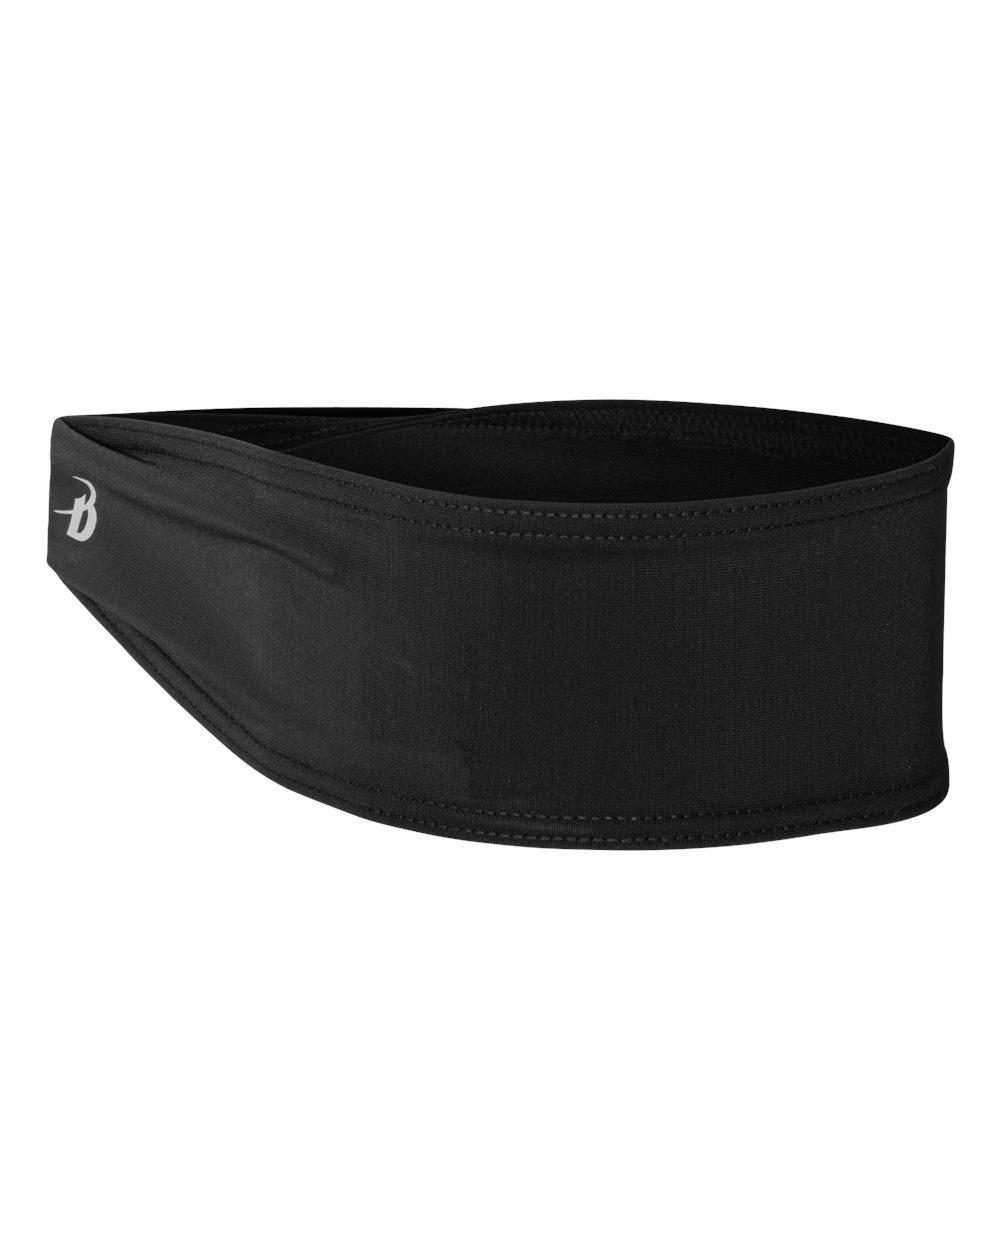 Badger 0300 - Headband